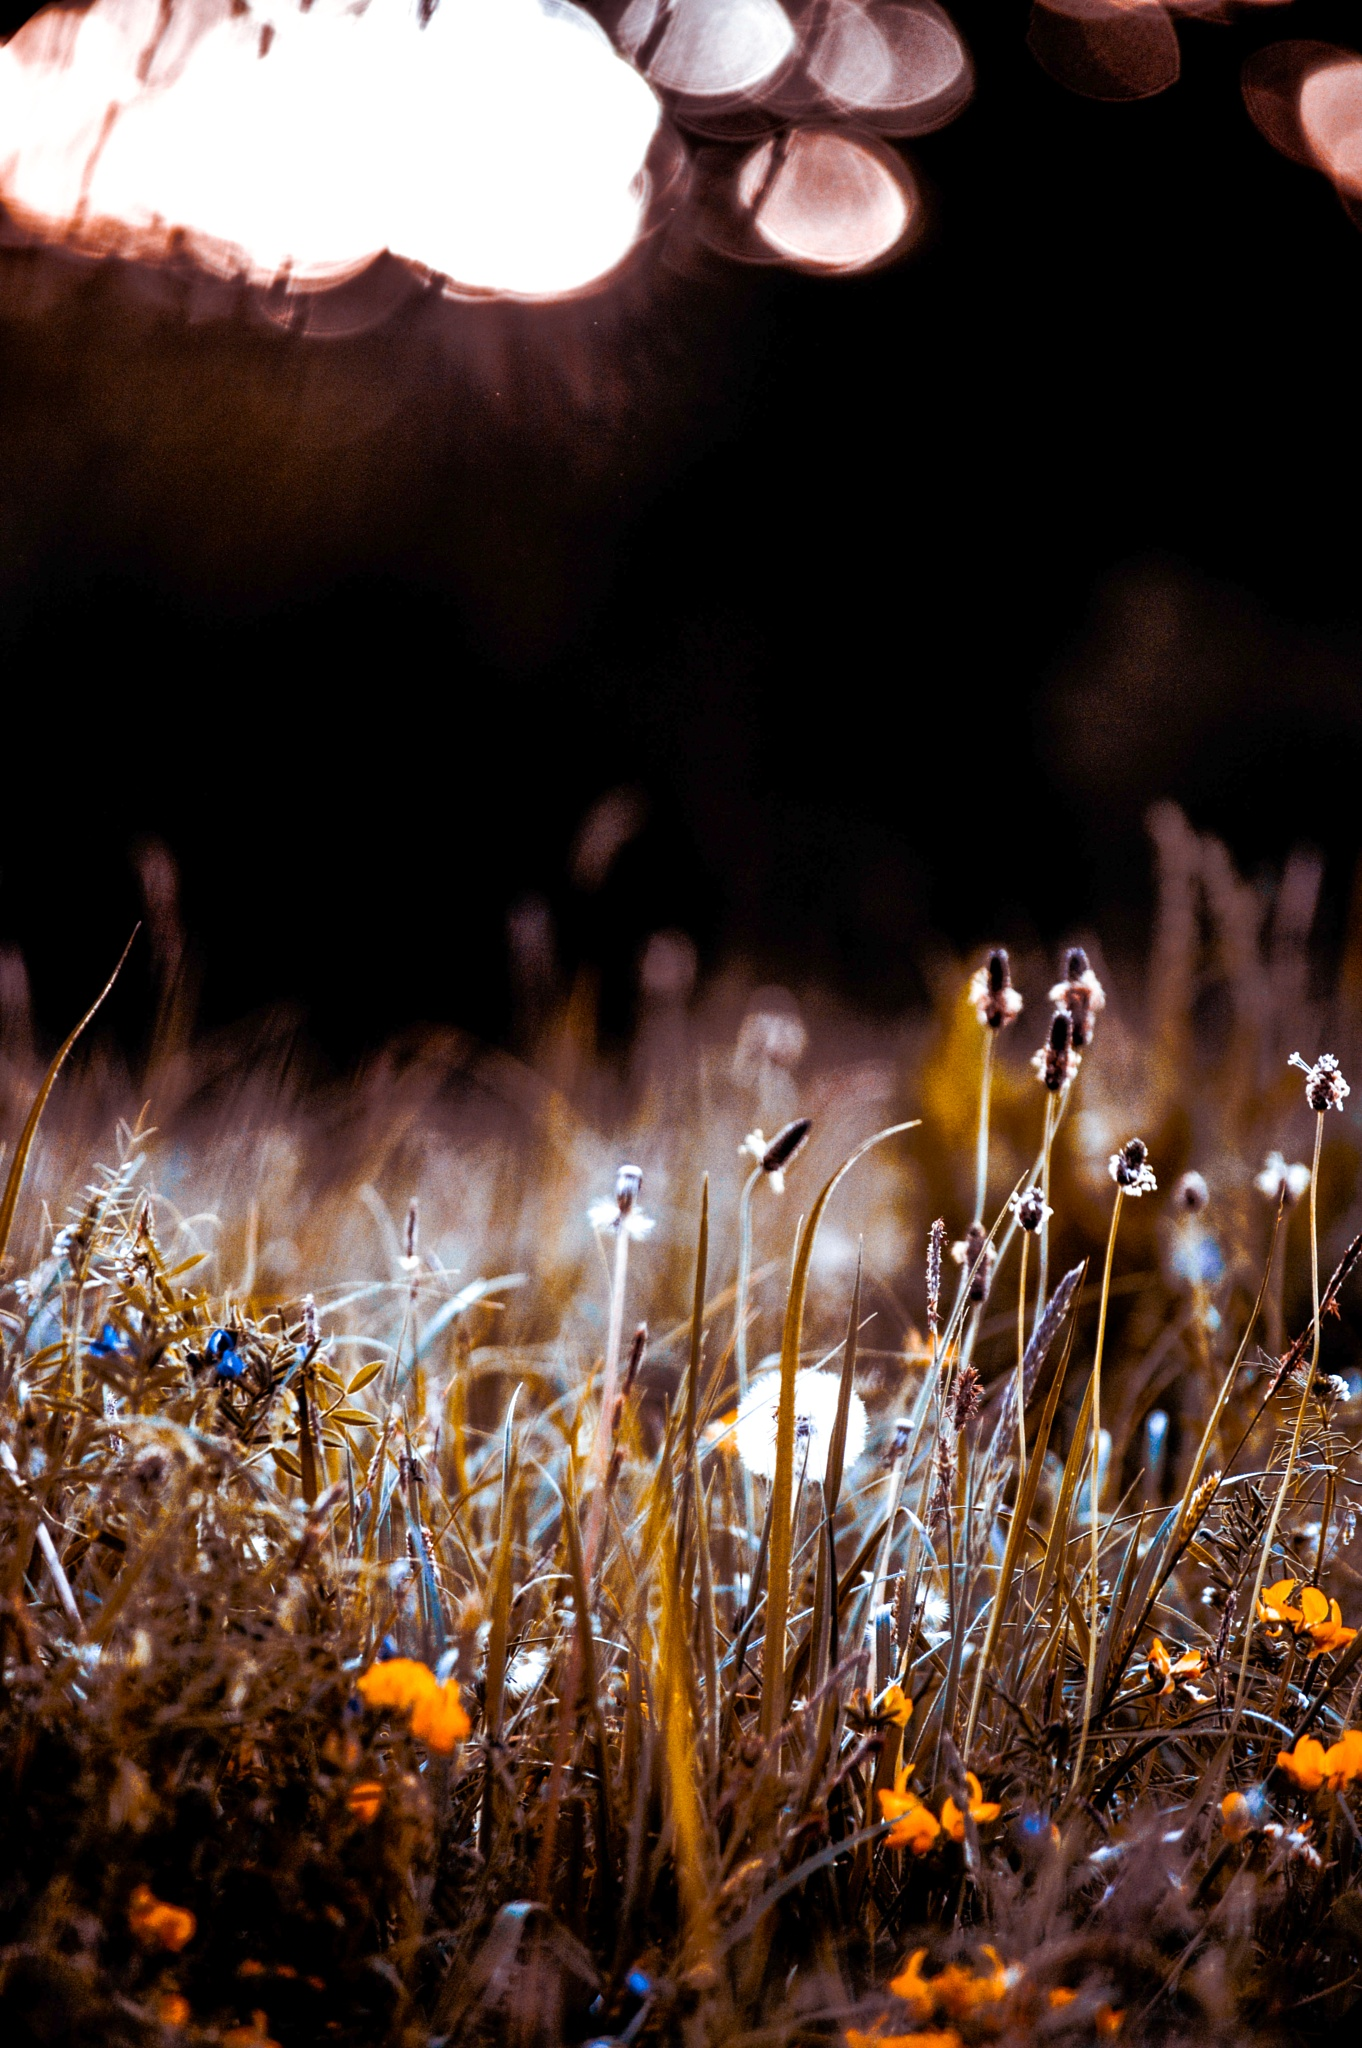 Flowers by Ganea Rafael